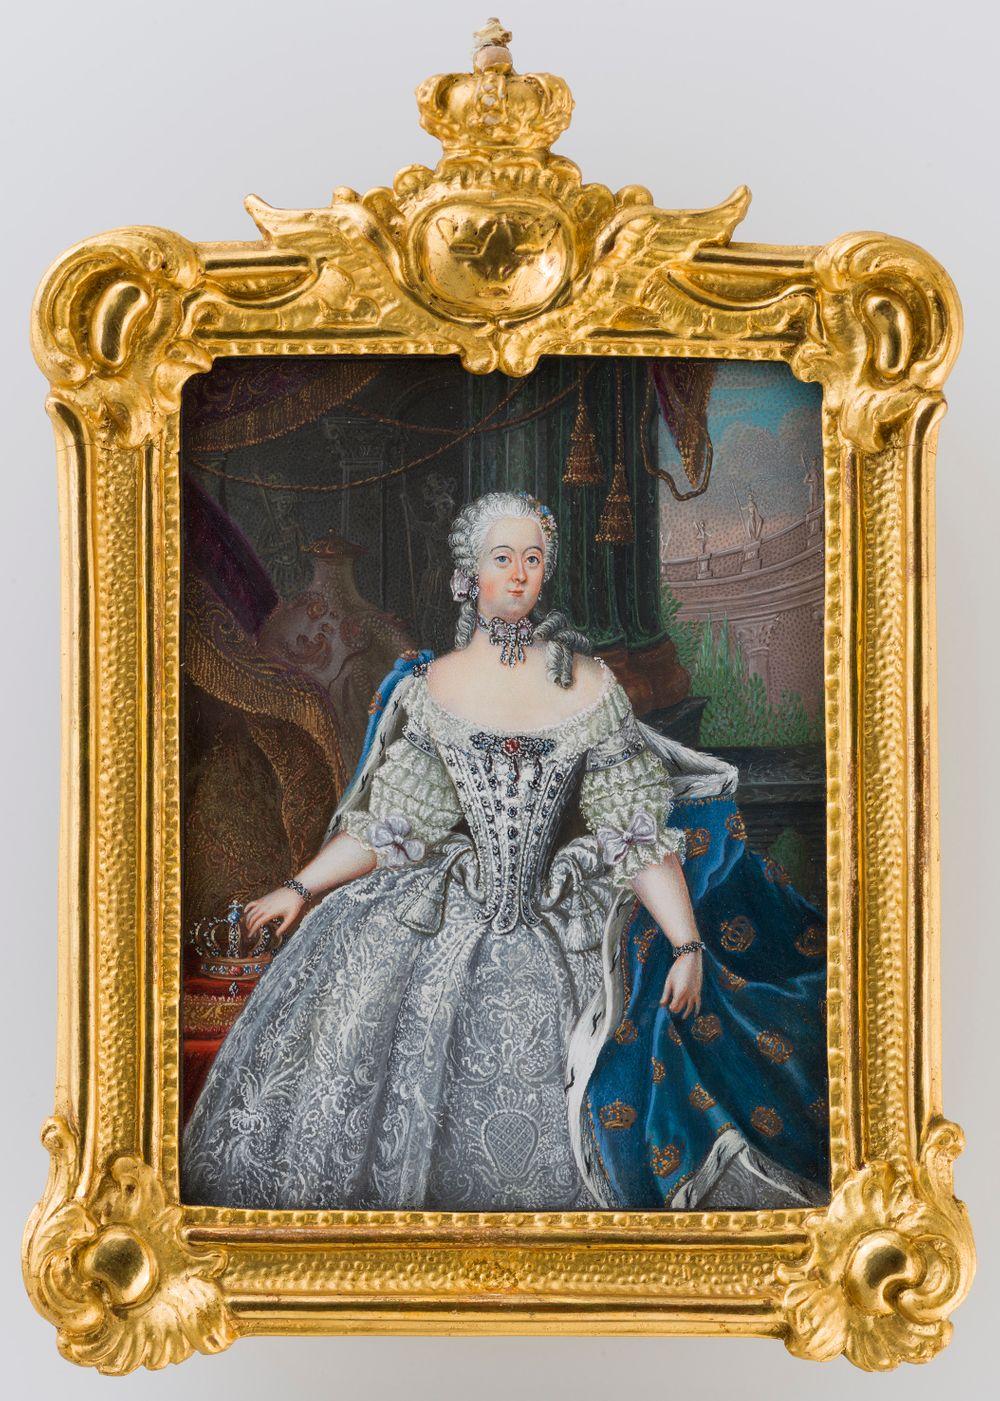 Kuningatar Lovisa Ulrika